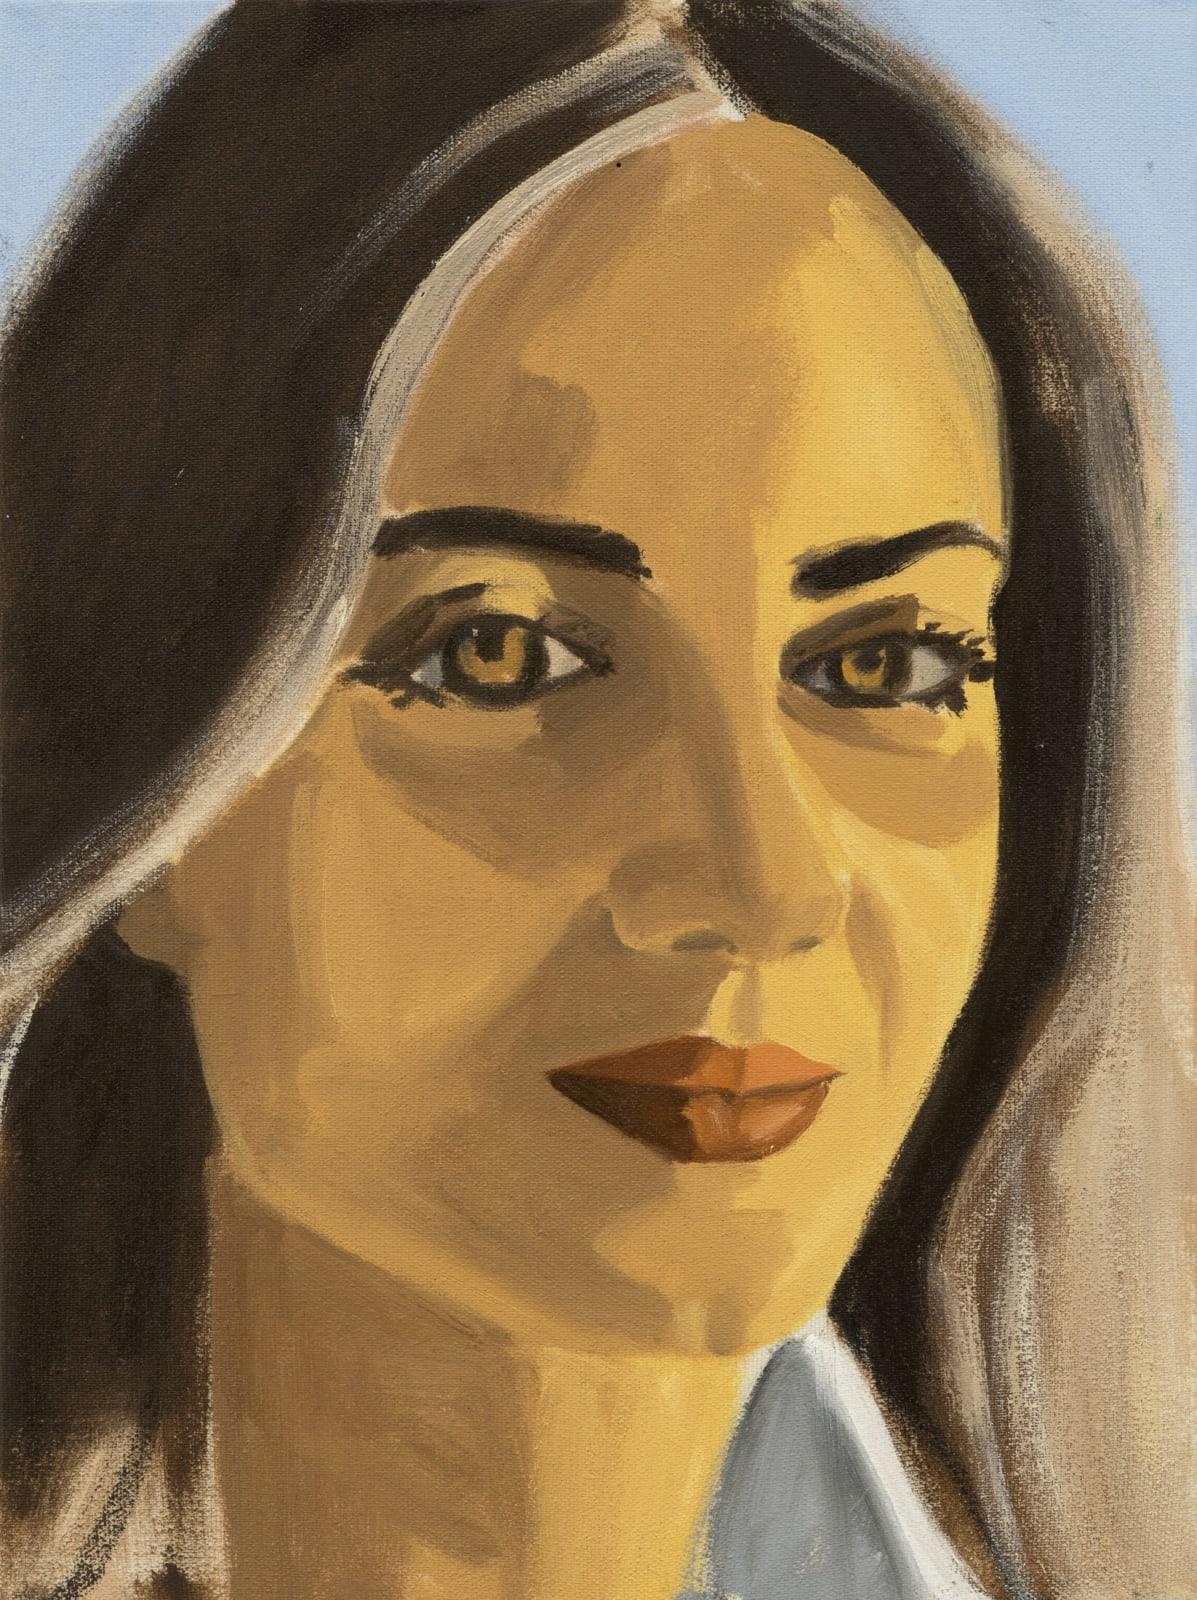 David Salle Untitled (portrait 24) 2019 oil on linen 12 x 9 inches 30.5 x 22.9 cm